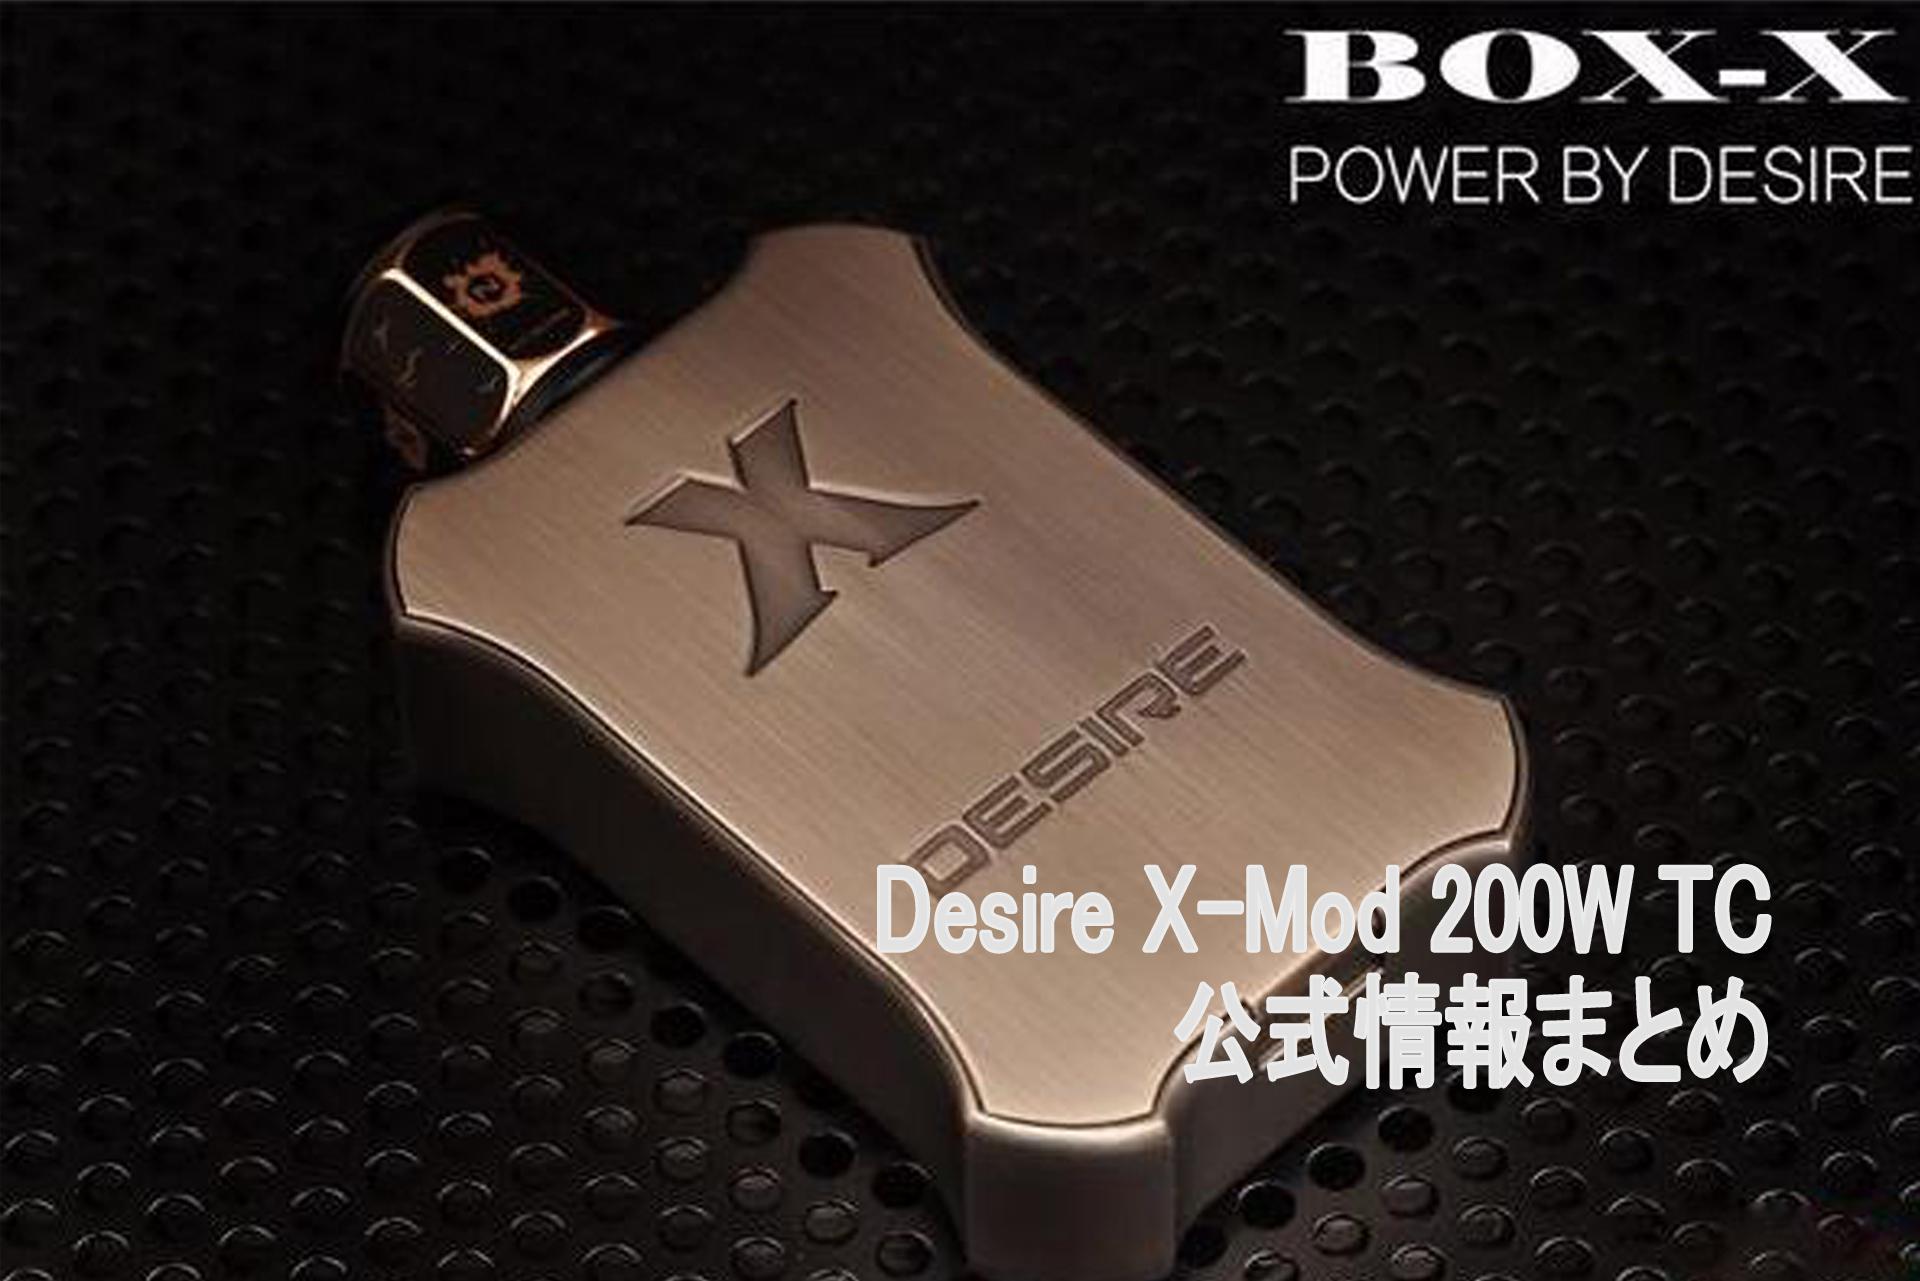 Desire X-Mod 200W TCの公式情報まとめ